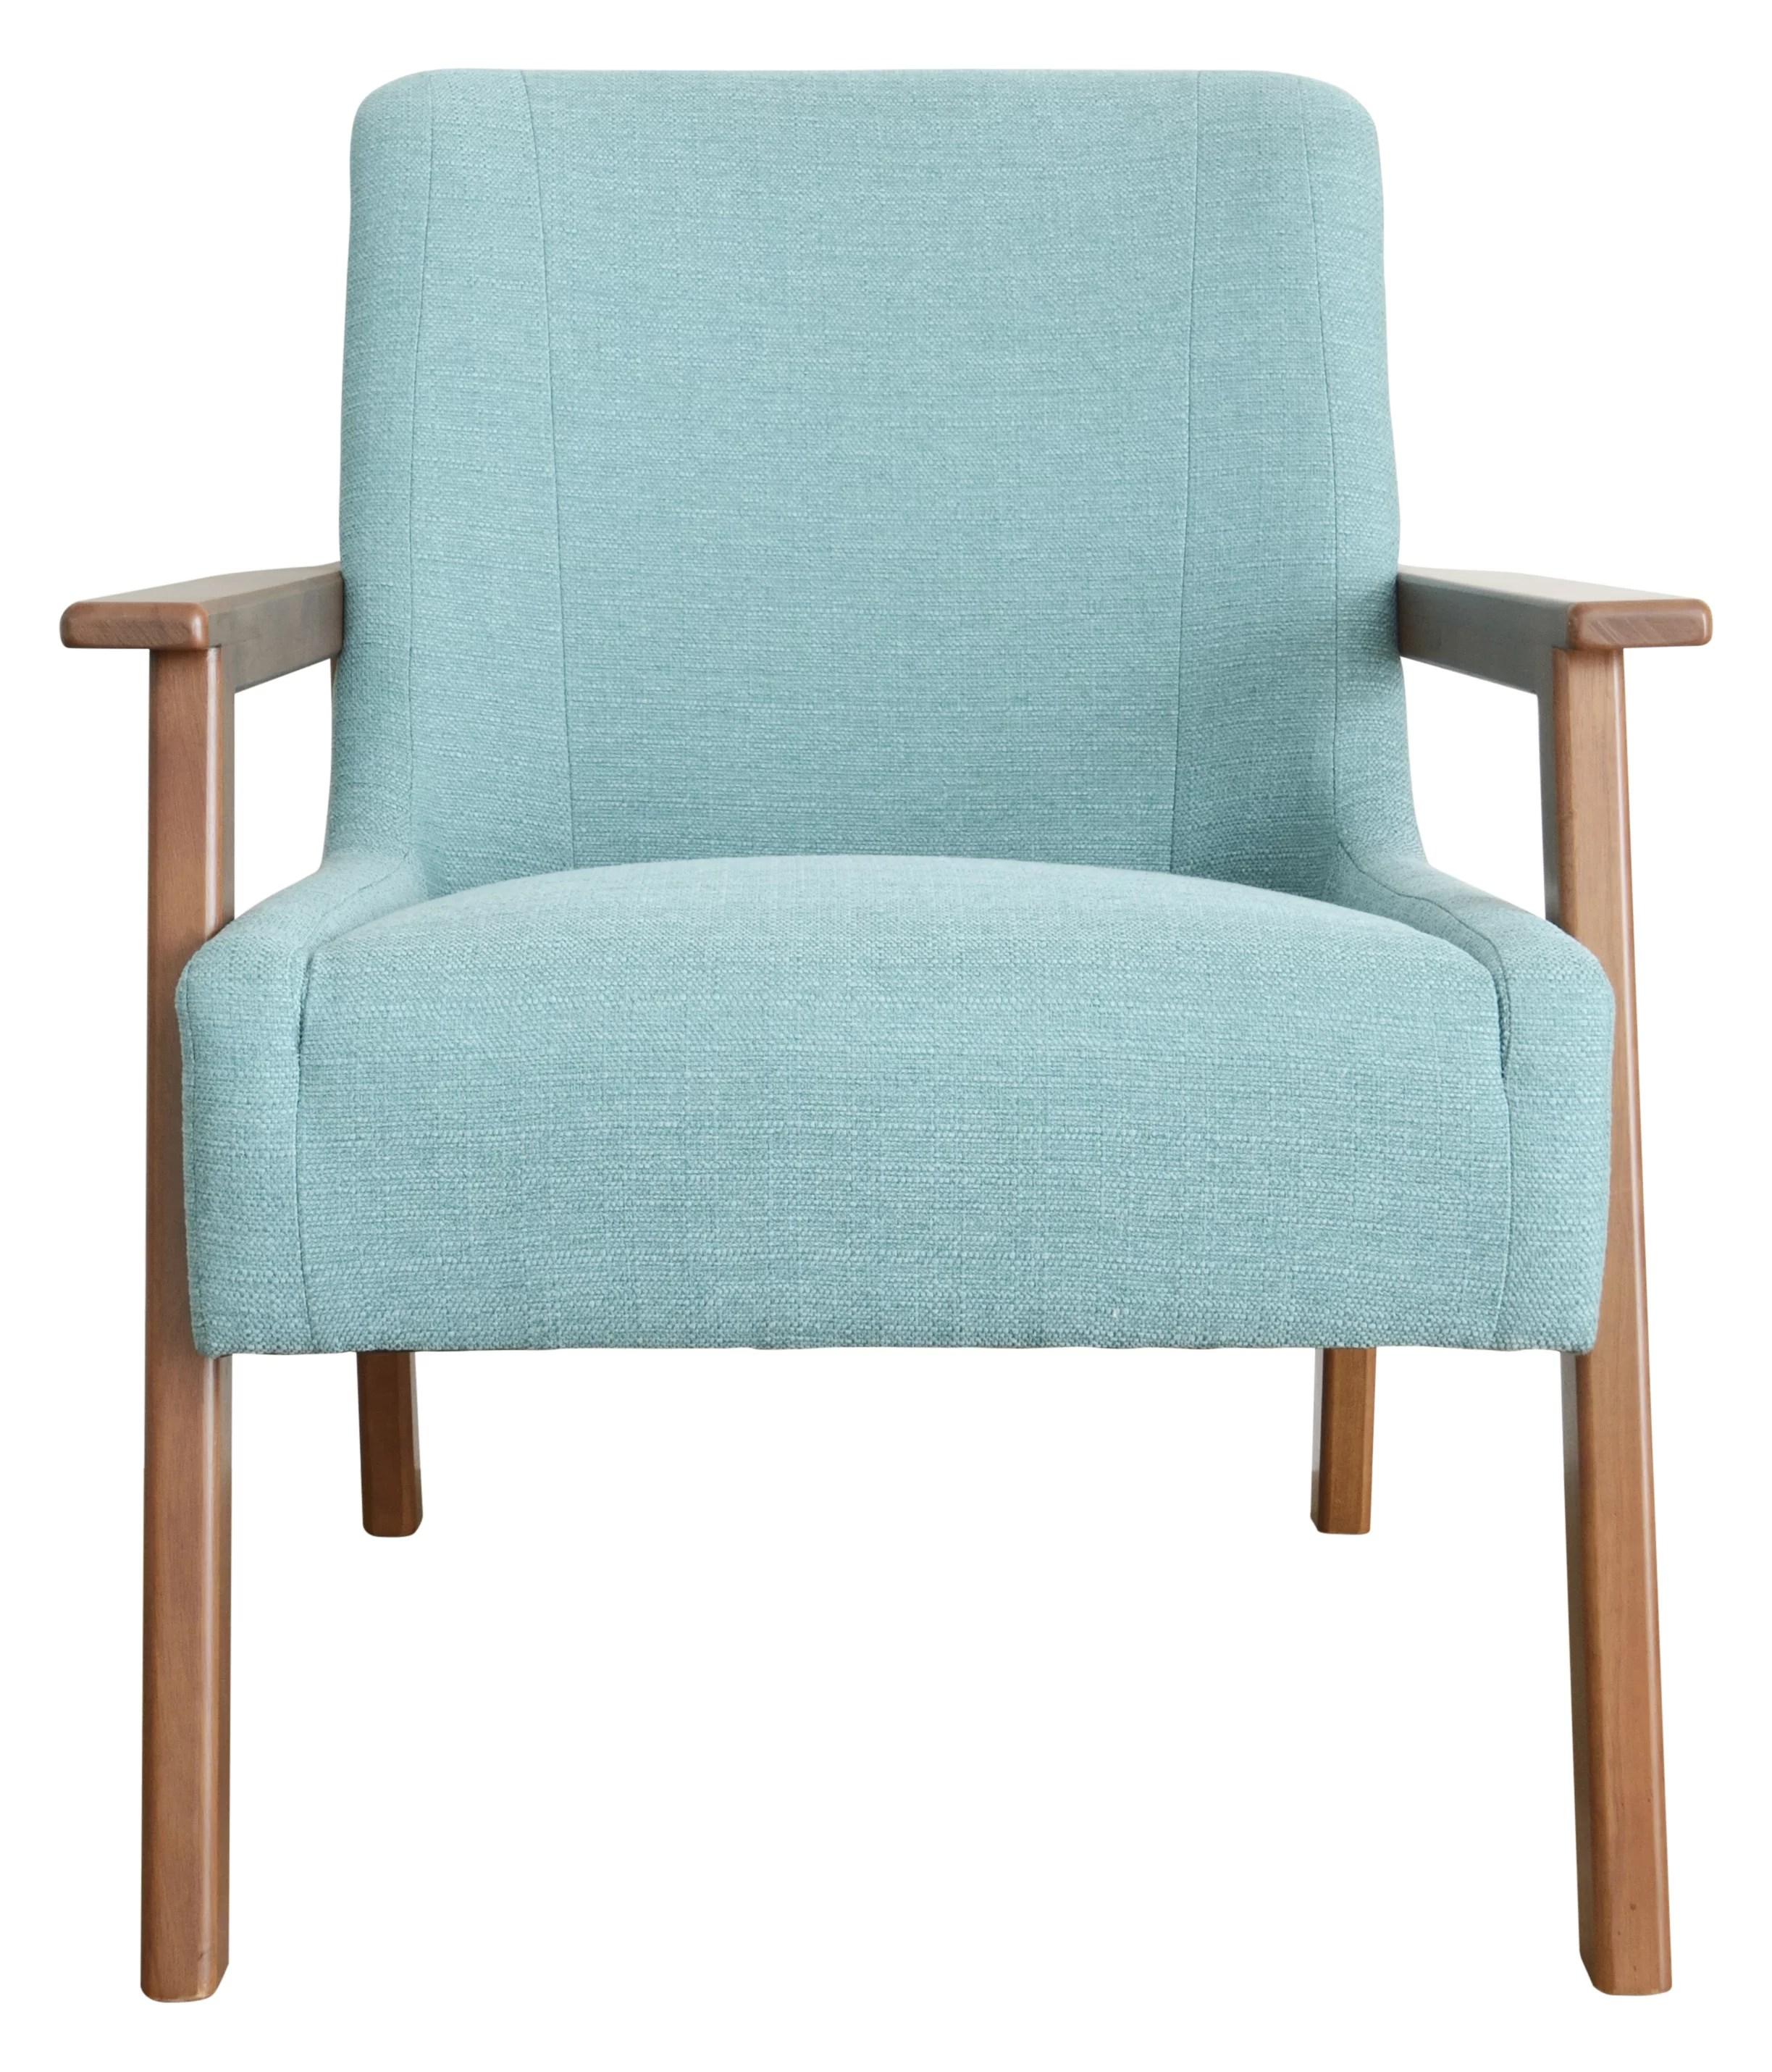 turquoise lounge chair rental covers and table linens novogratz hudson walmart com